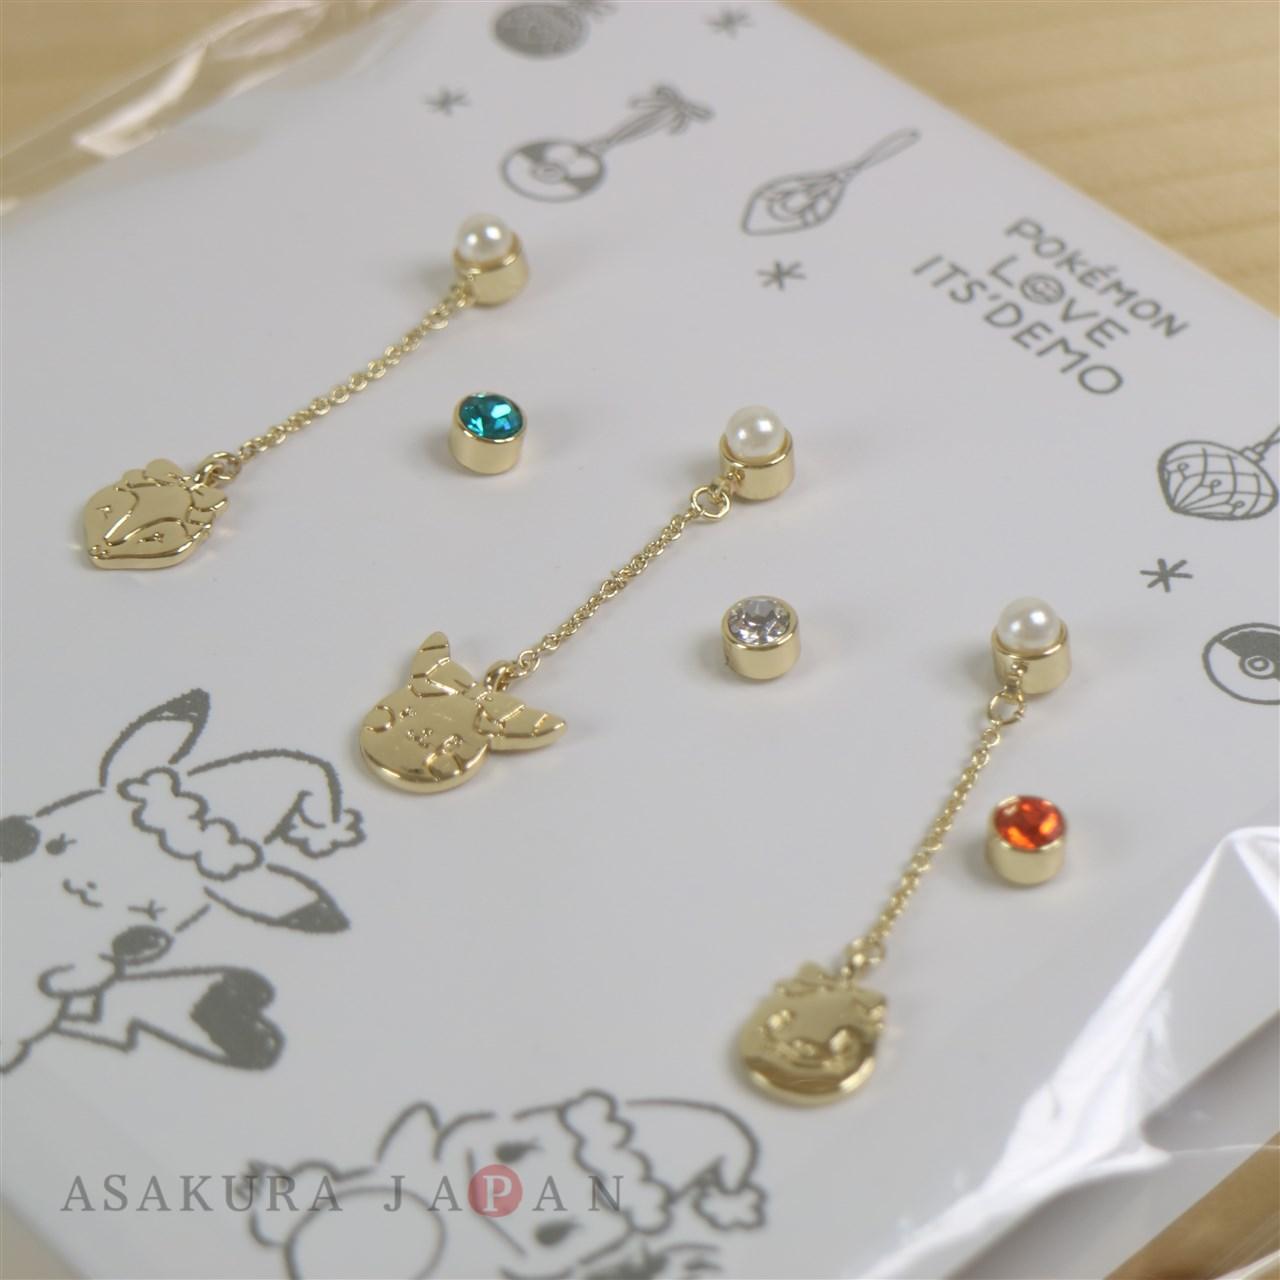 POKEMON LOVE ITS/' DEMO Christmas Pierce Pierced Earrings 6 pcs Pikachu